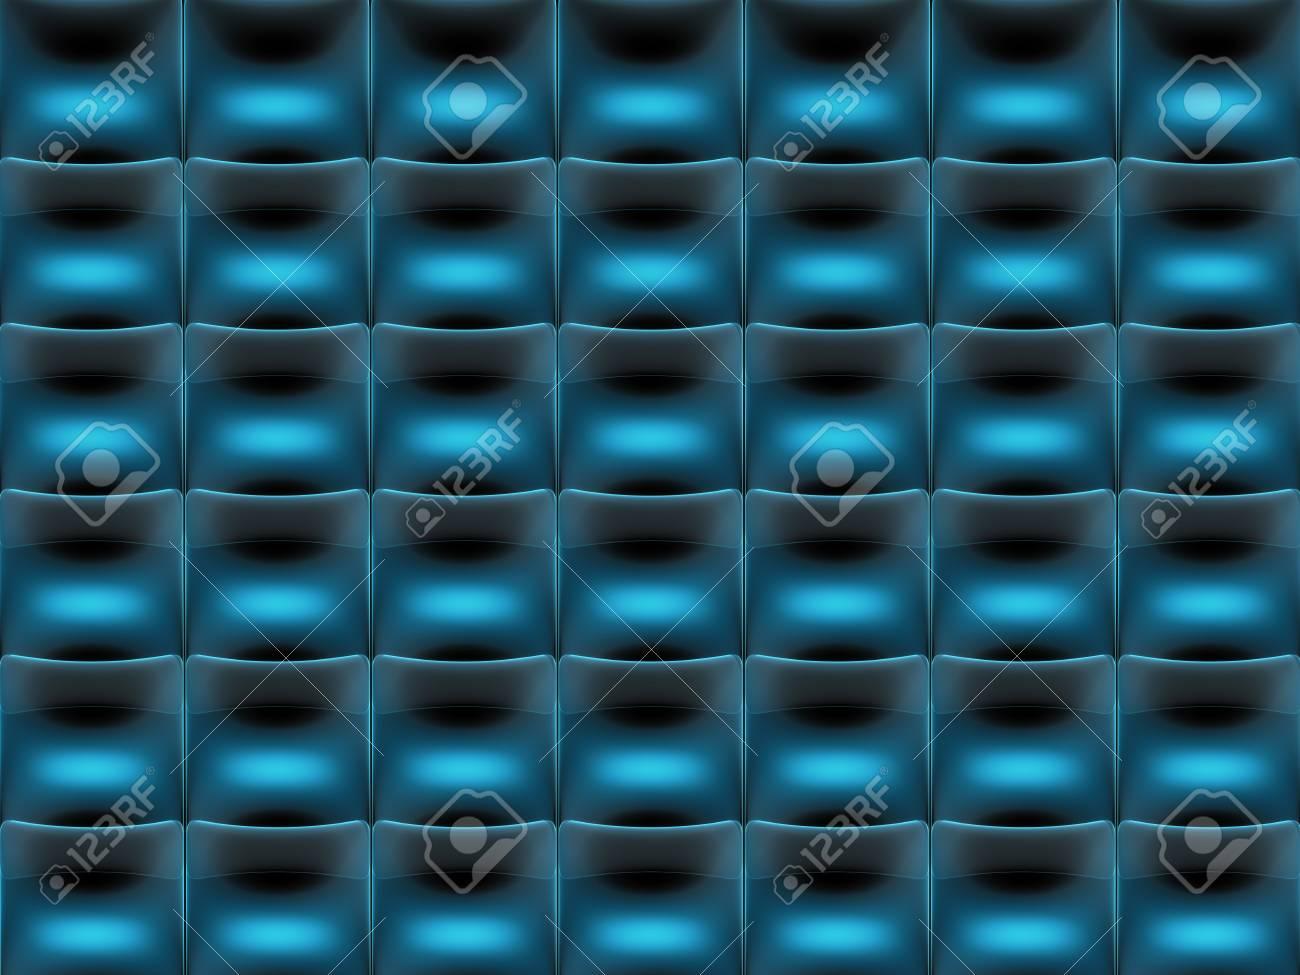 Blue color square tile pattern background transparent Stock Photo - 20227719